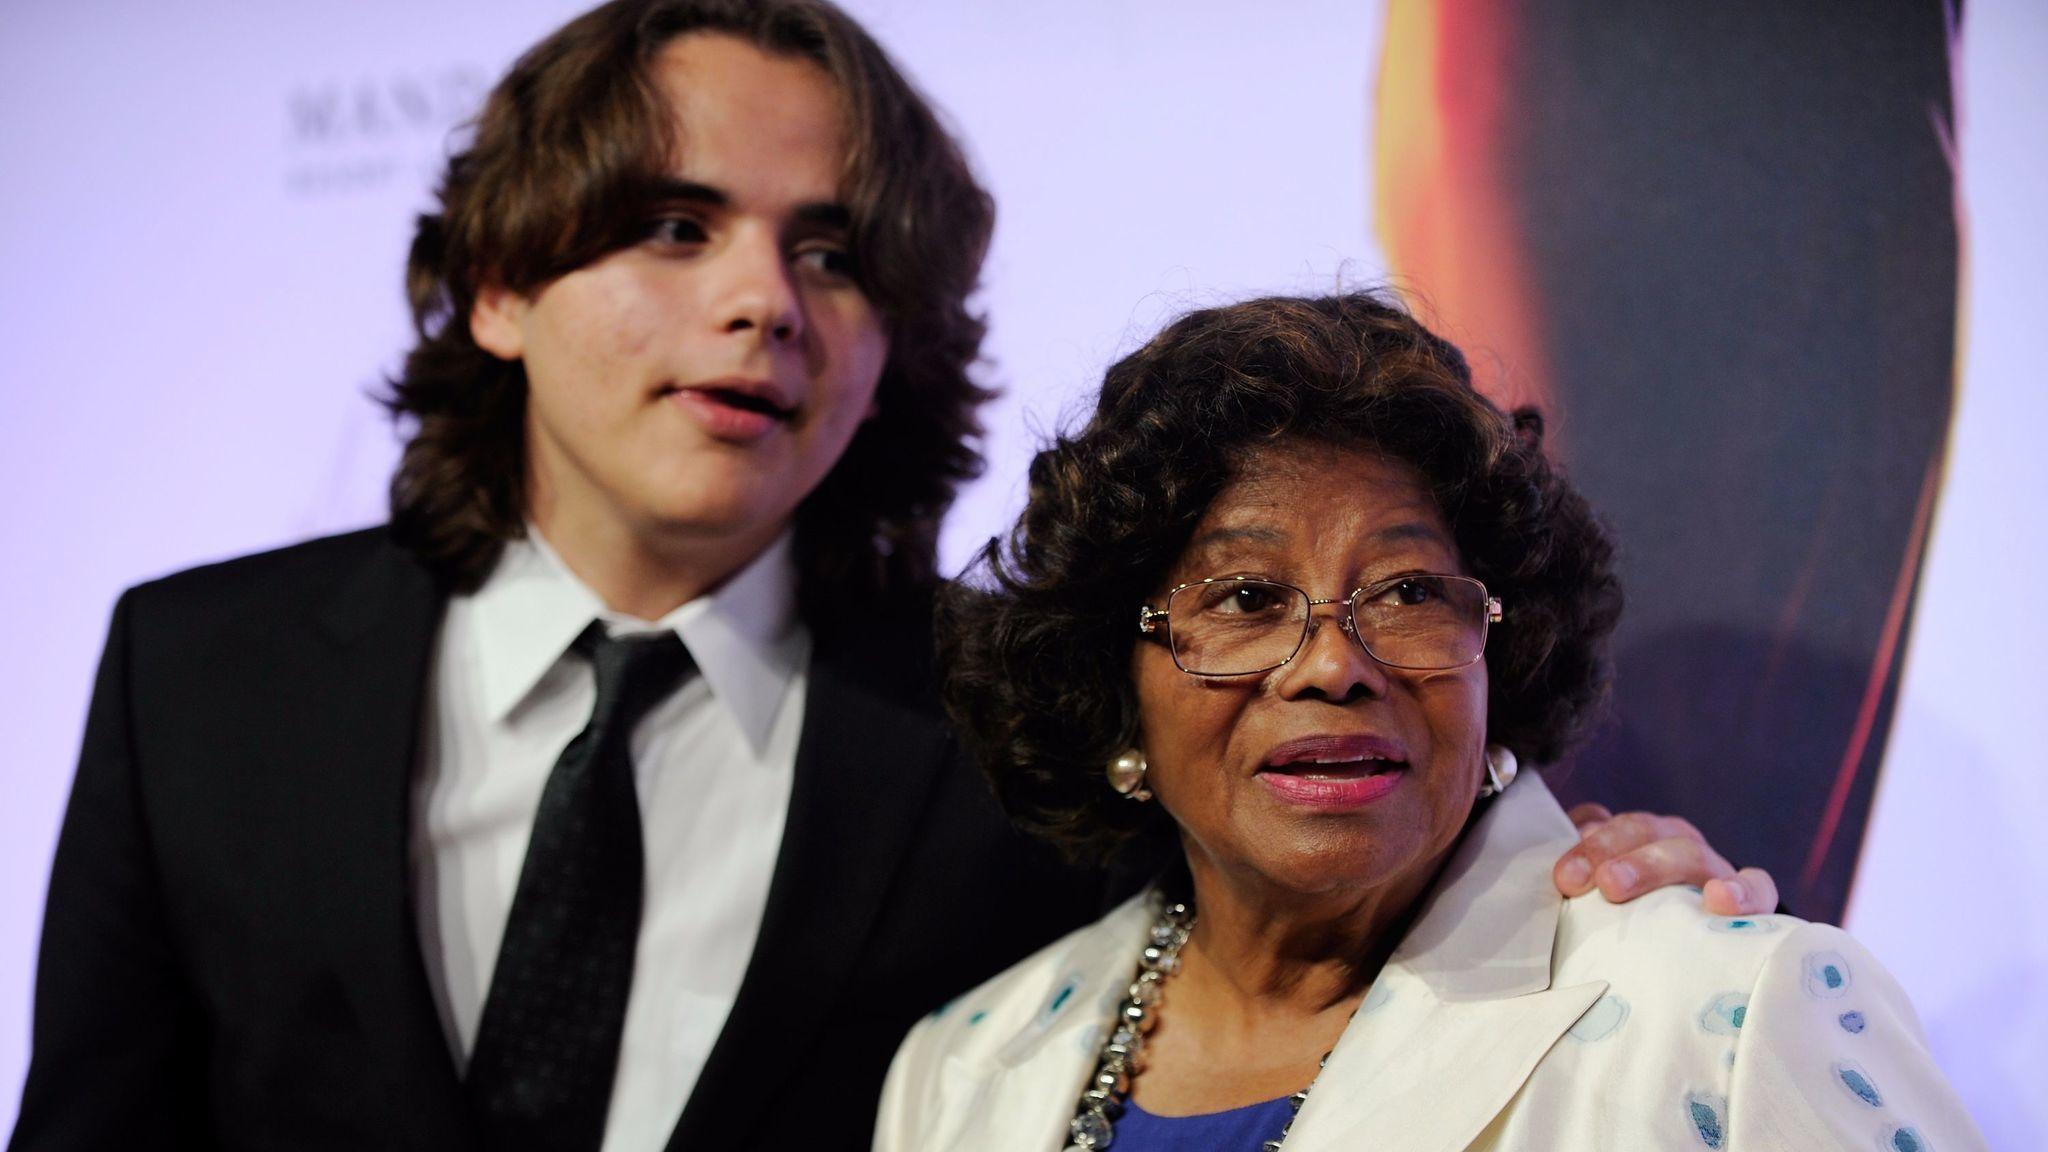 Prince Jackson, left, and Katherine Jackson arrive at the world premiere of